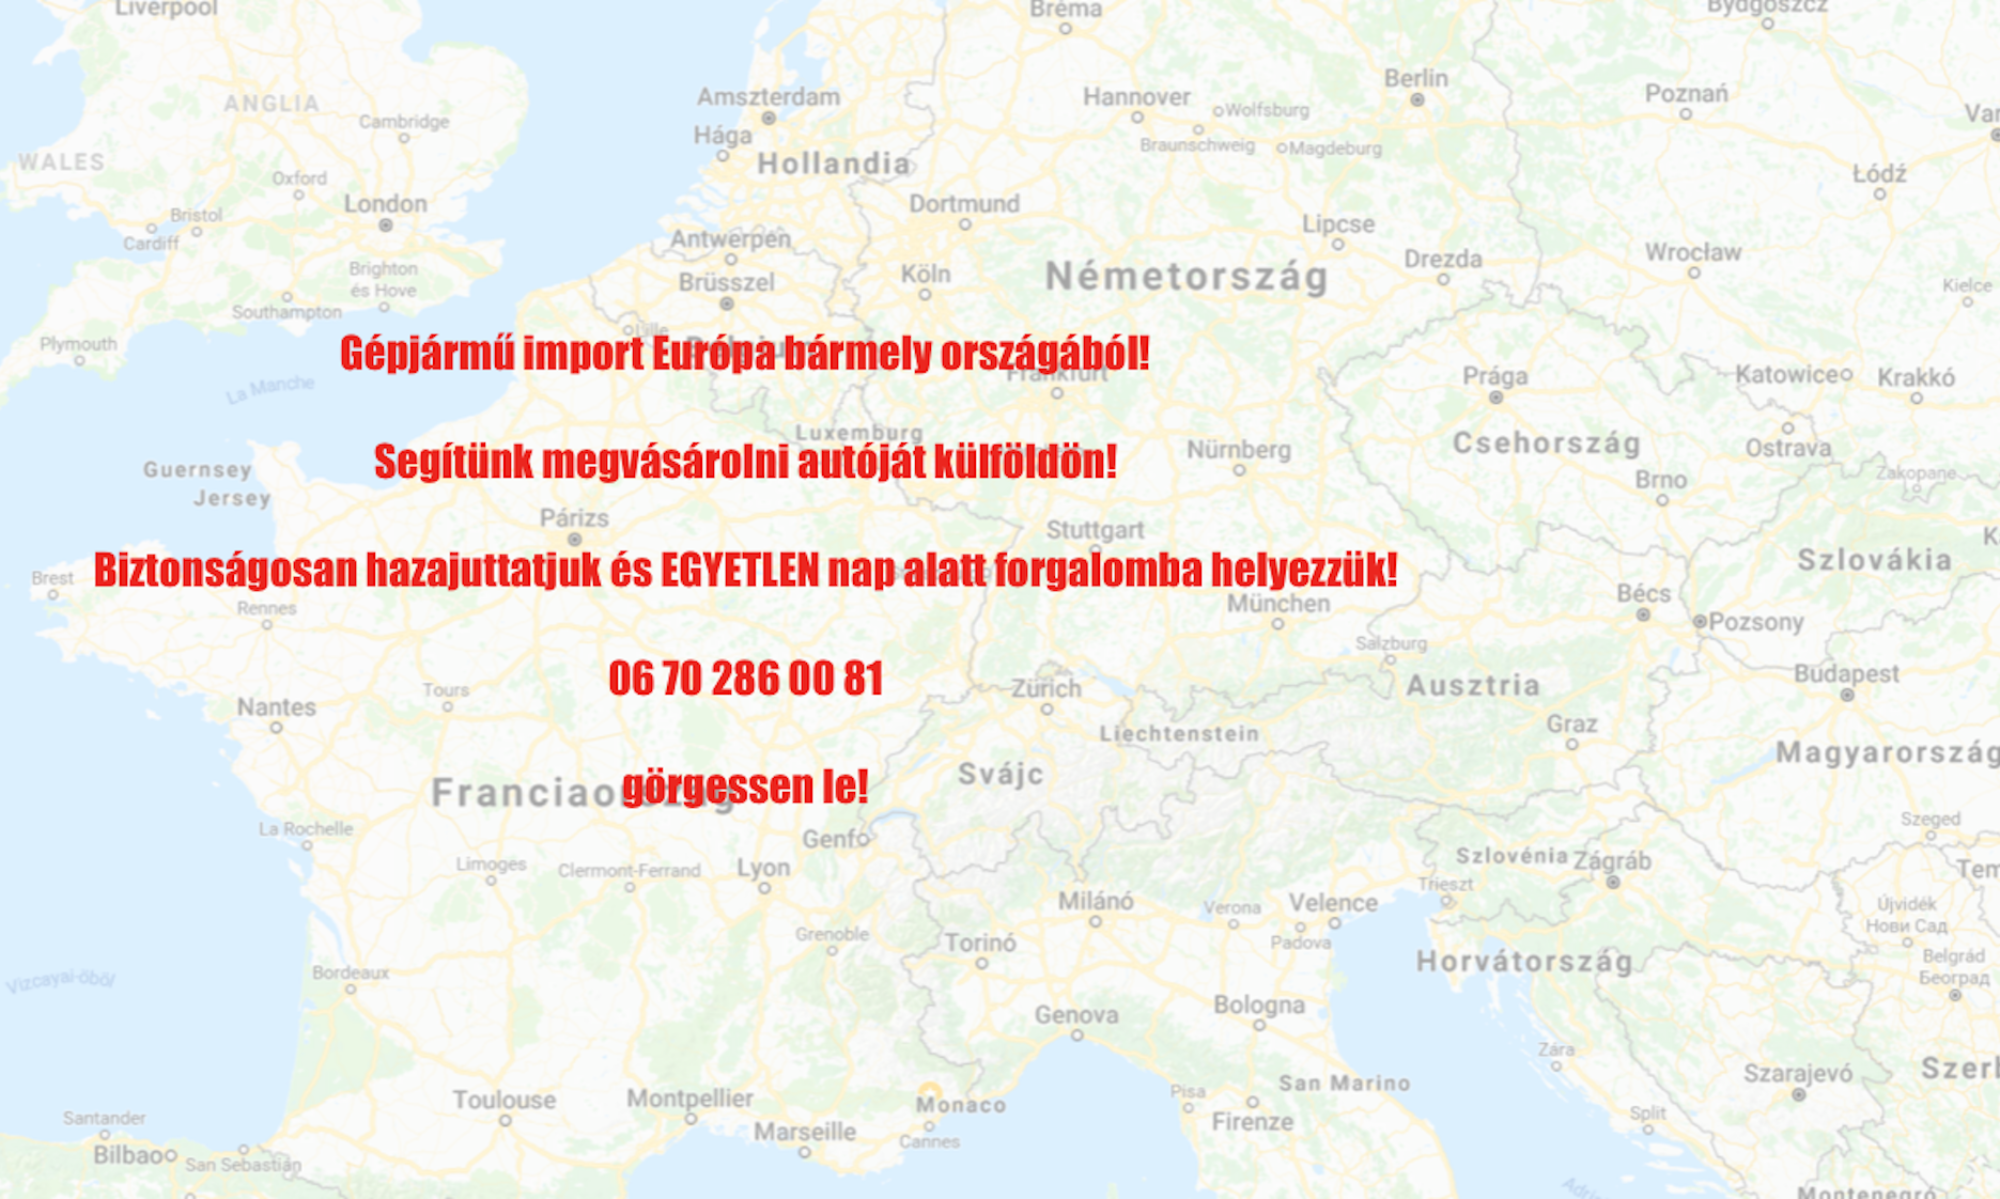 Bérnepper -  06 70 286 00 81